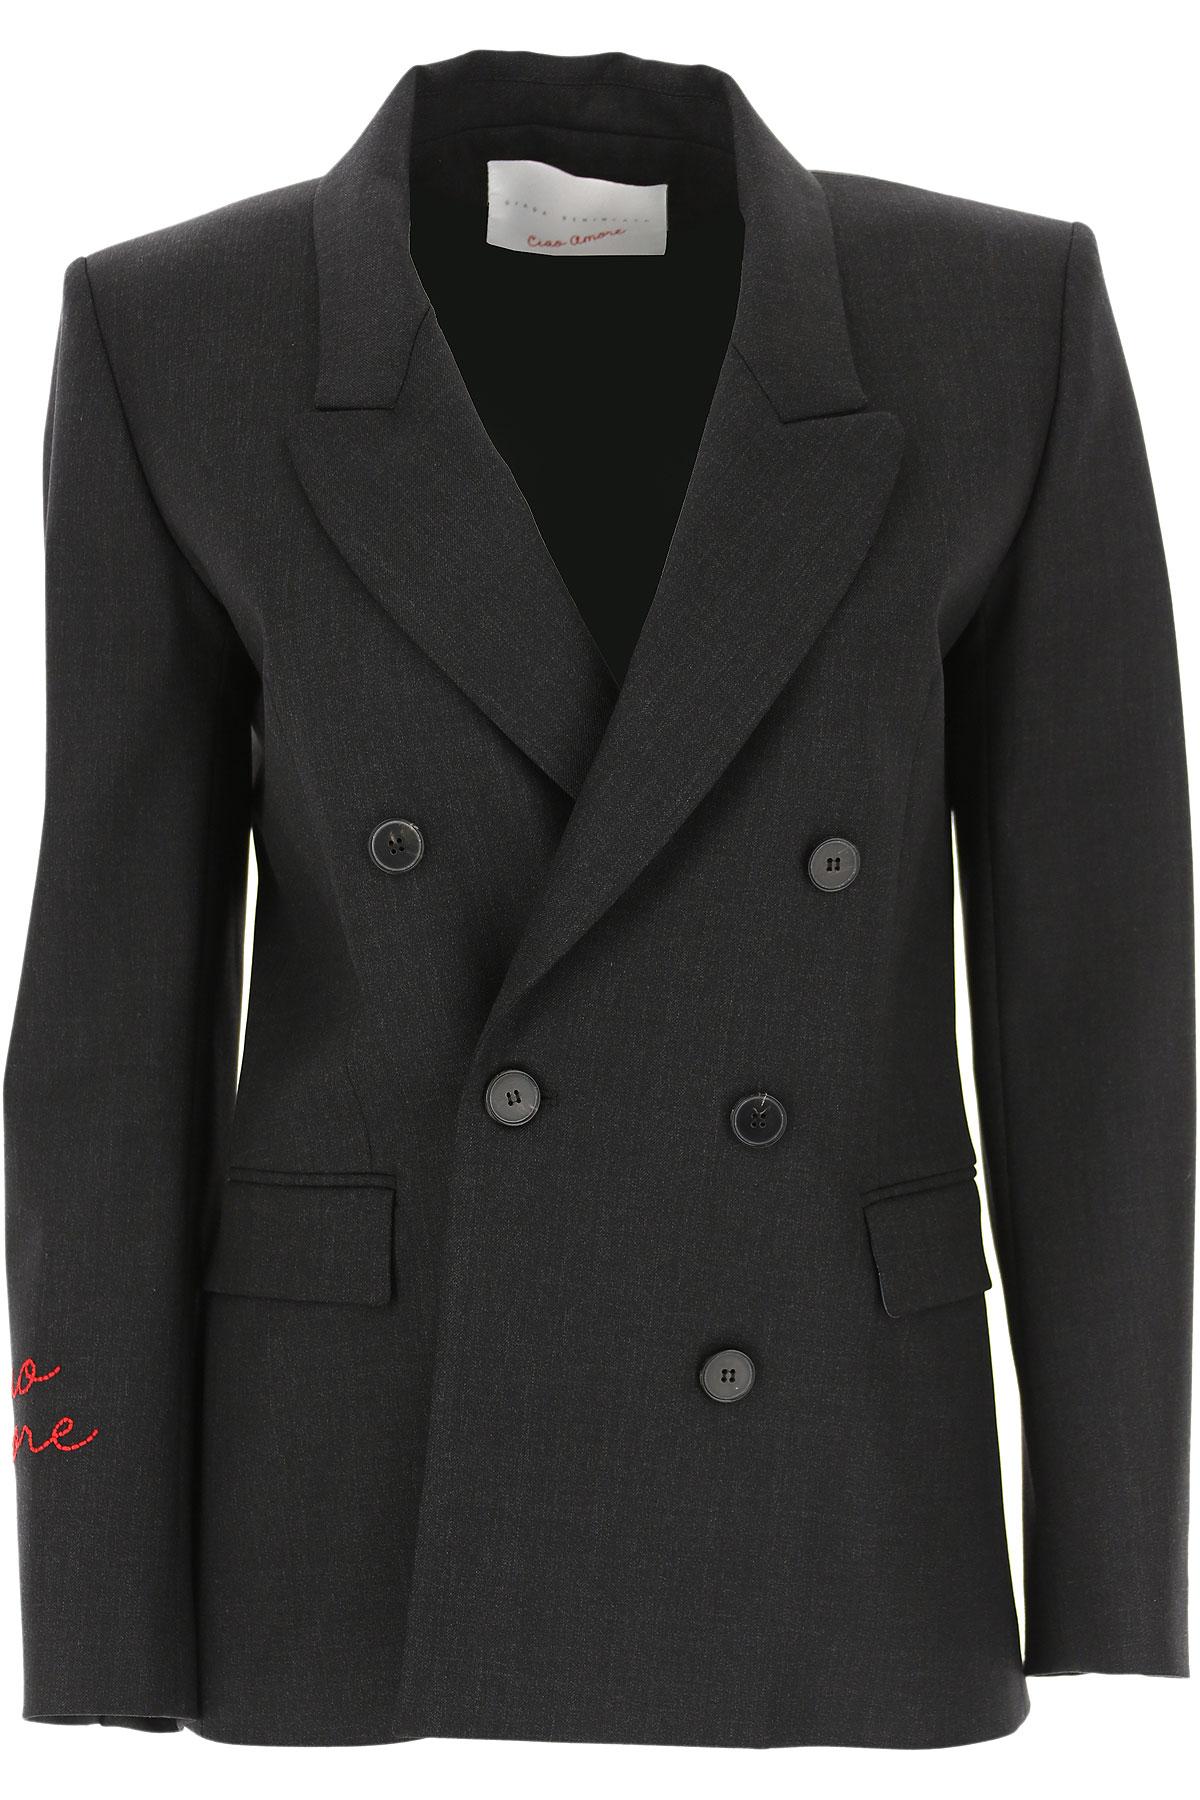 Giada Benincasa Blazer for Women On Sale, Anthracite Grey, Virgin wool, 2019, 4 8